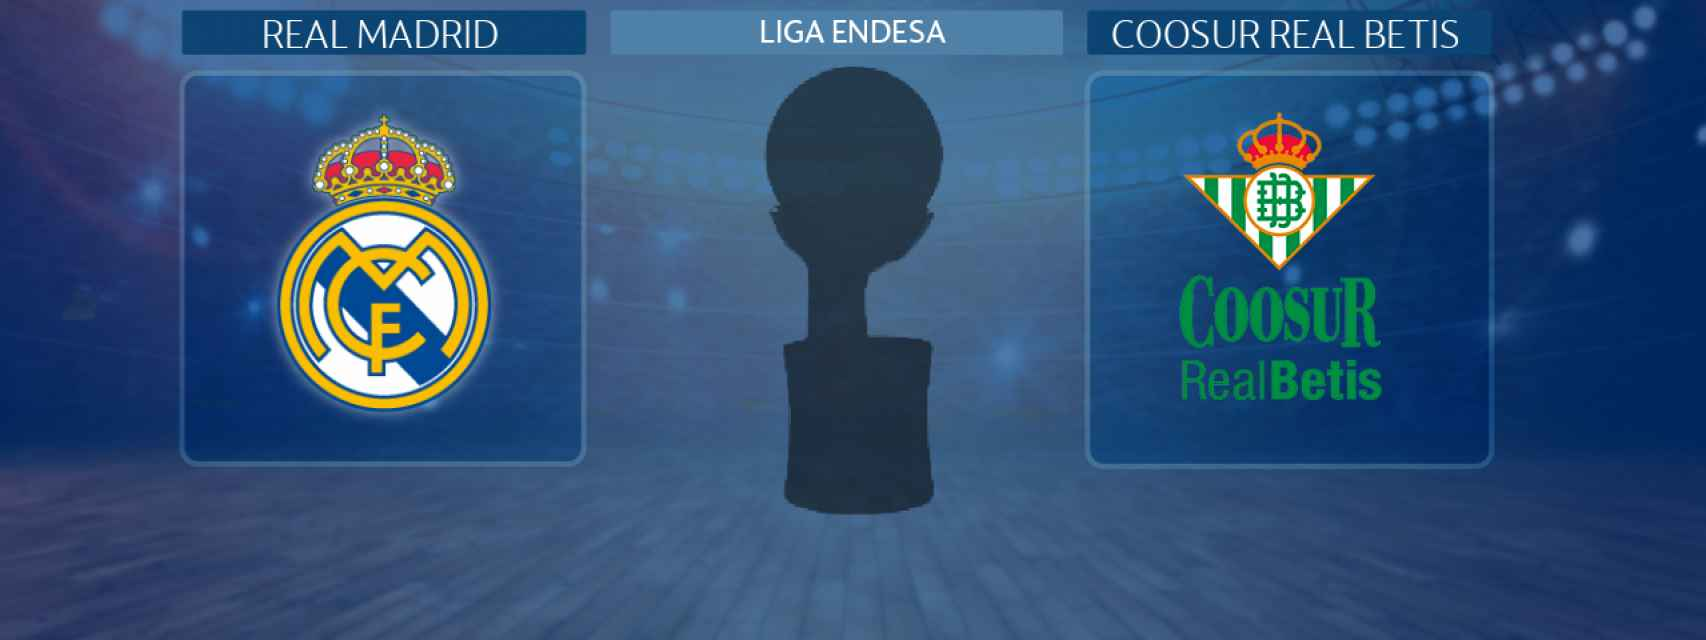 Real Madrid - Coosur Real Betis, partido de la Liga Endesa